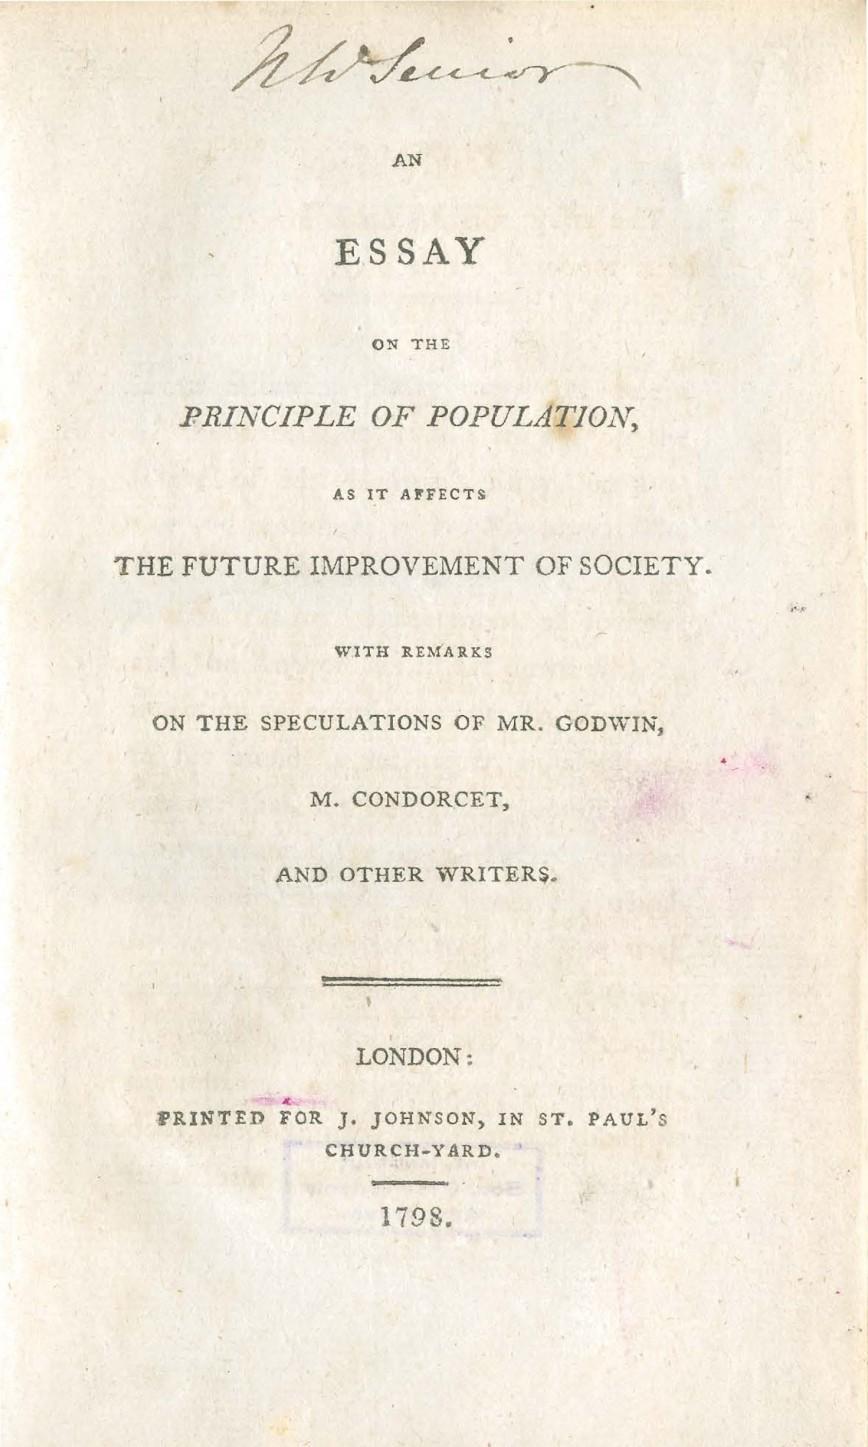 001 Essay On The Principle Of Population Singular Malthus Sparknotes Thomas Main Idea 868